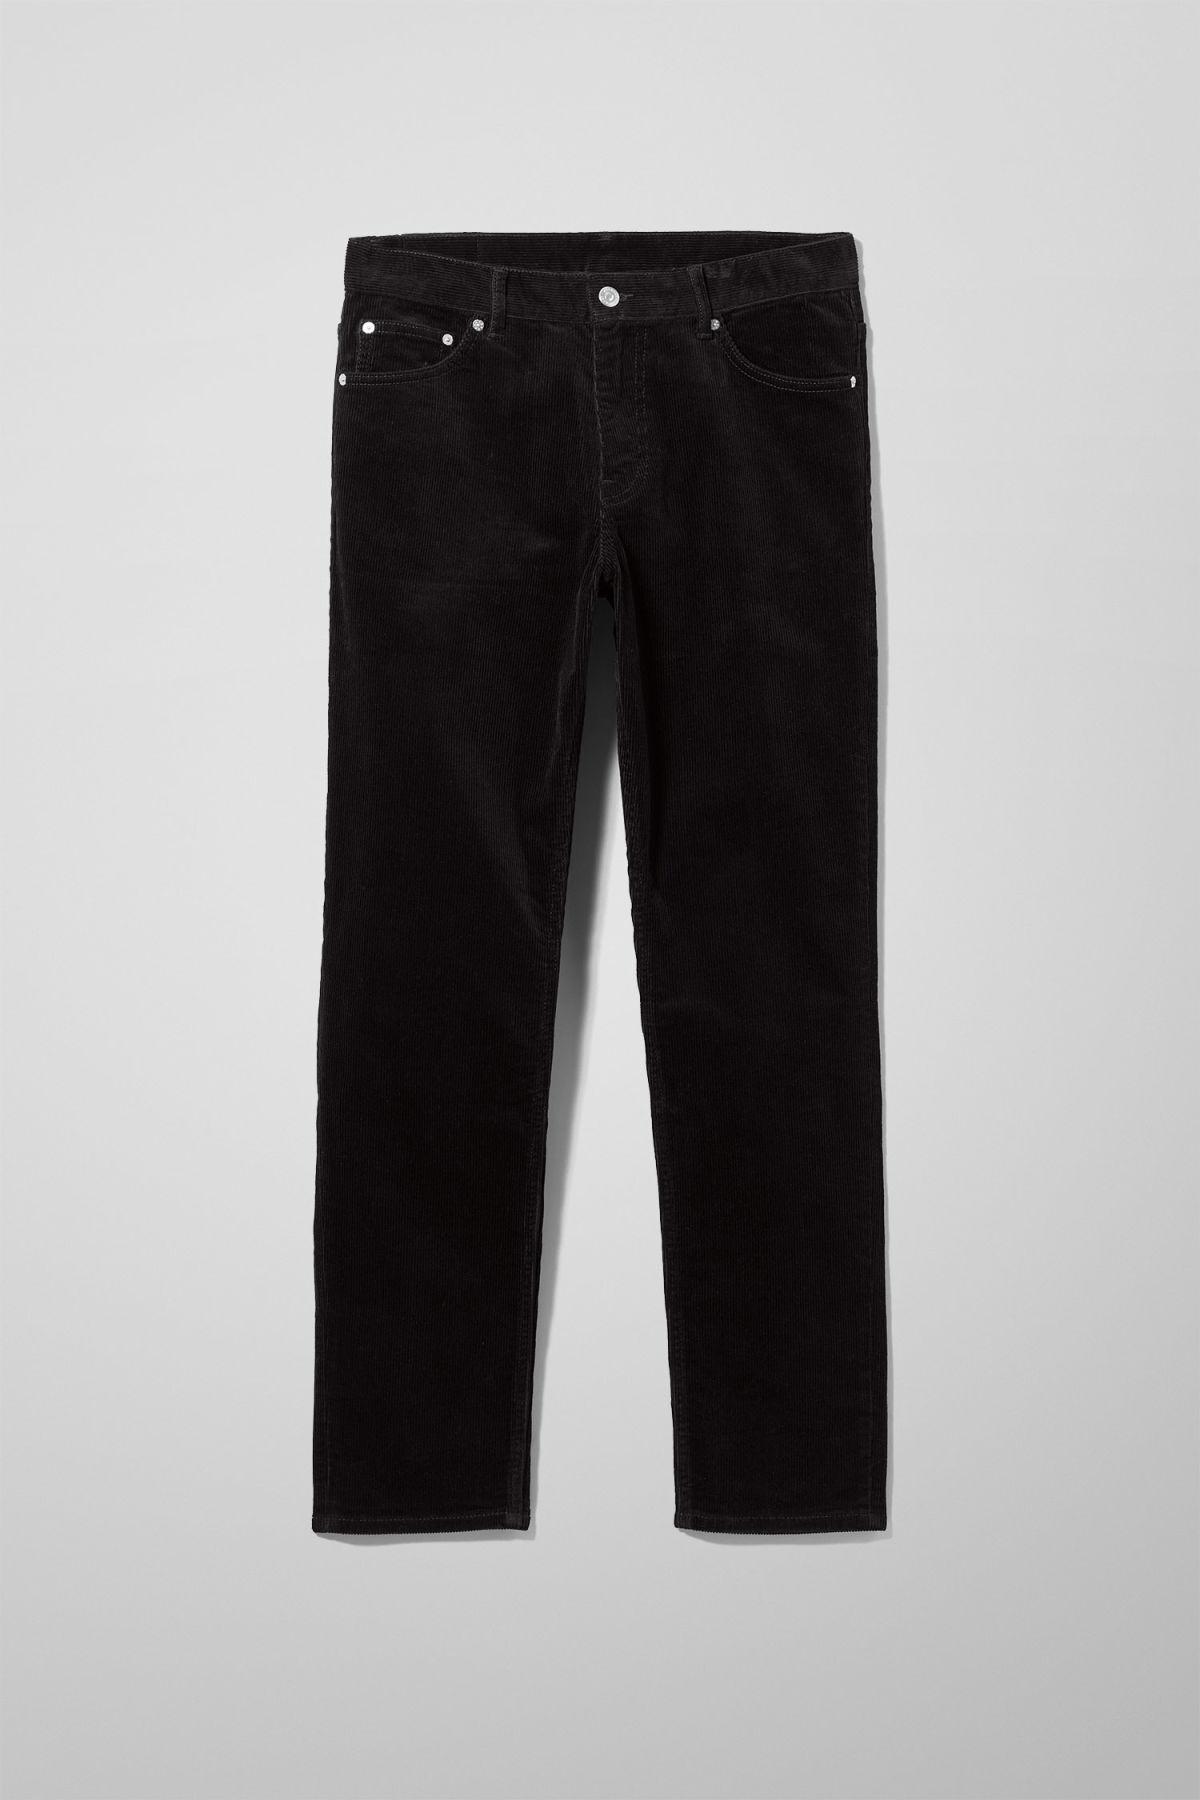 Sunday Corduroy Trousers - Black